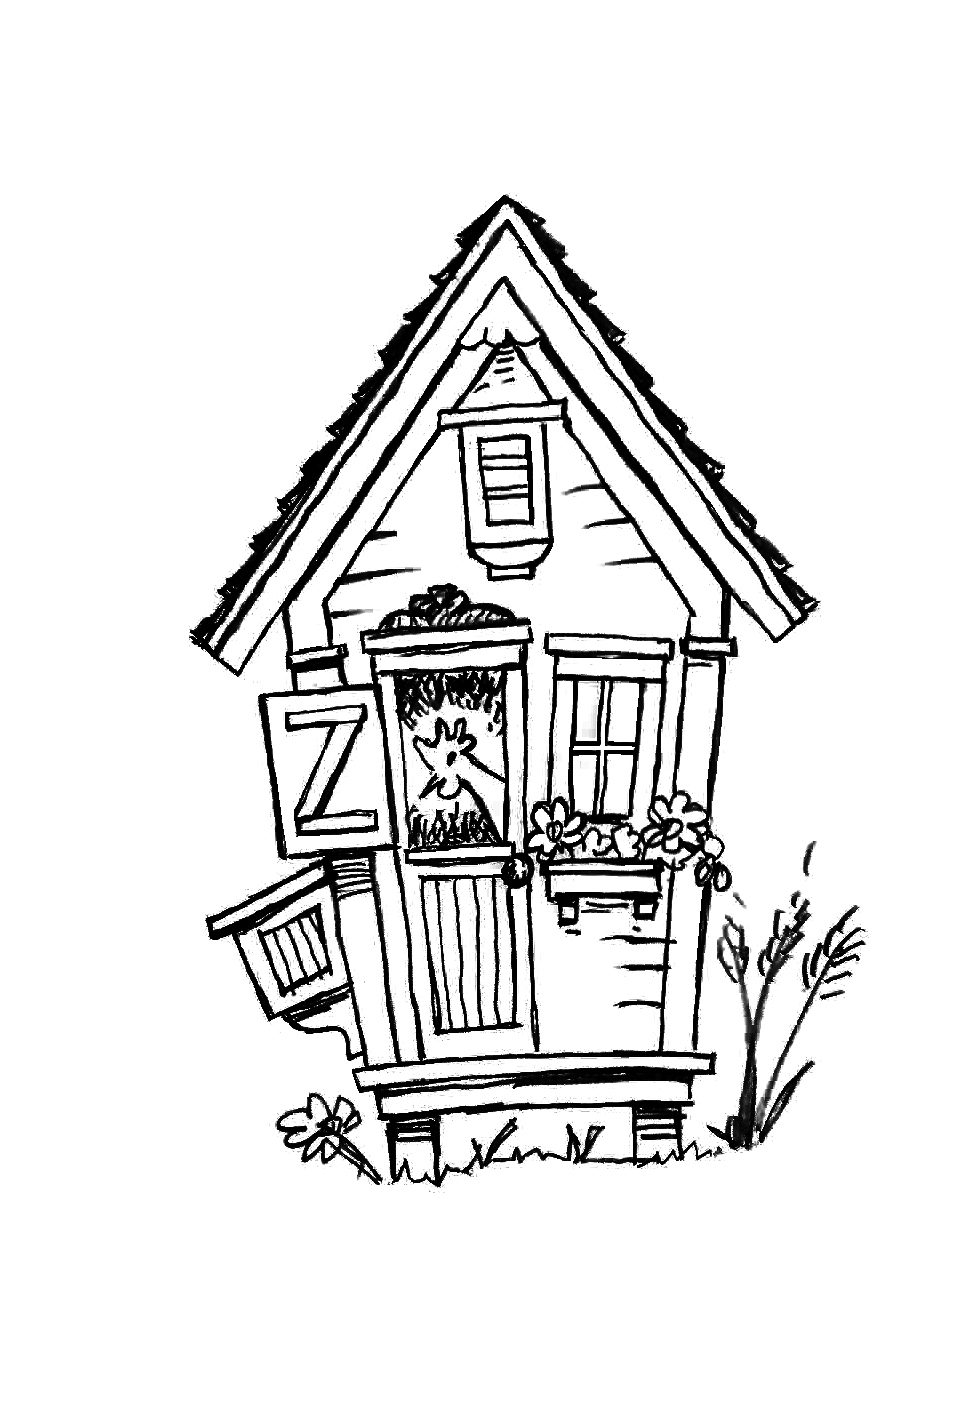 The Bird House - In Progress